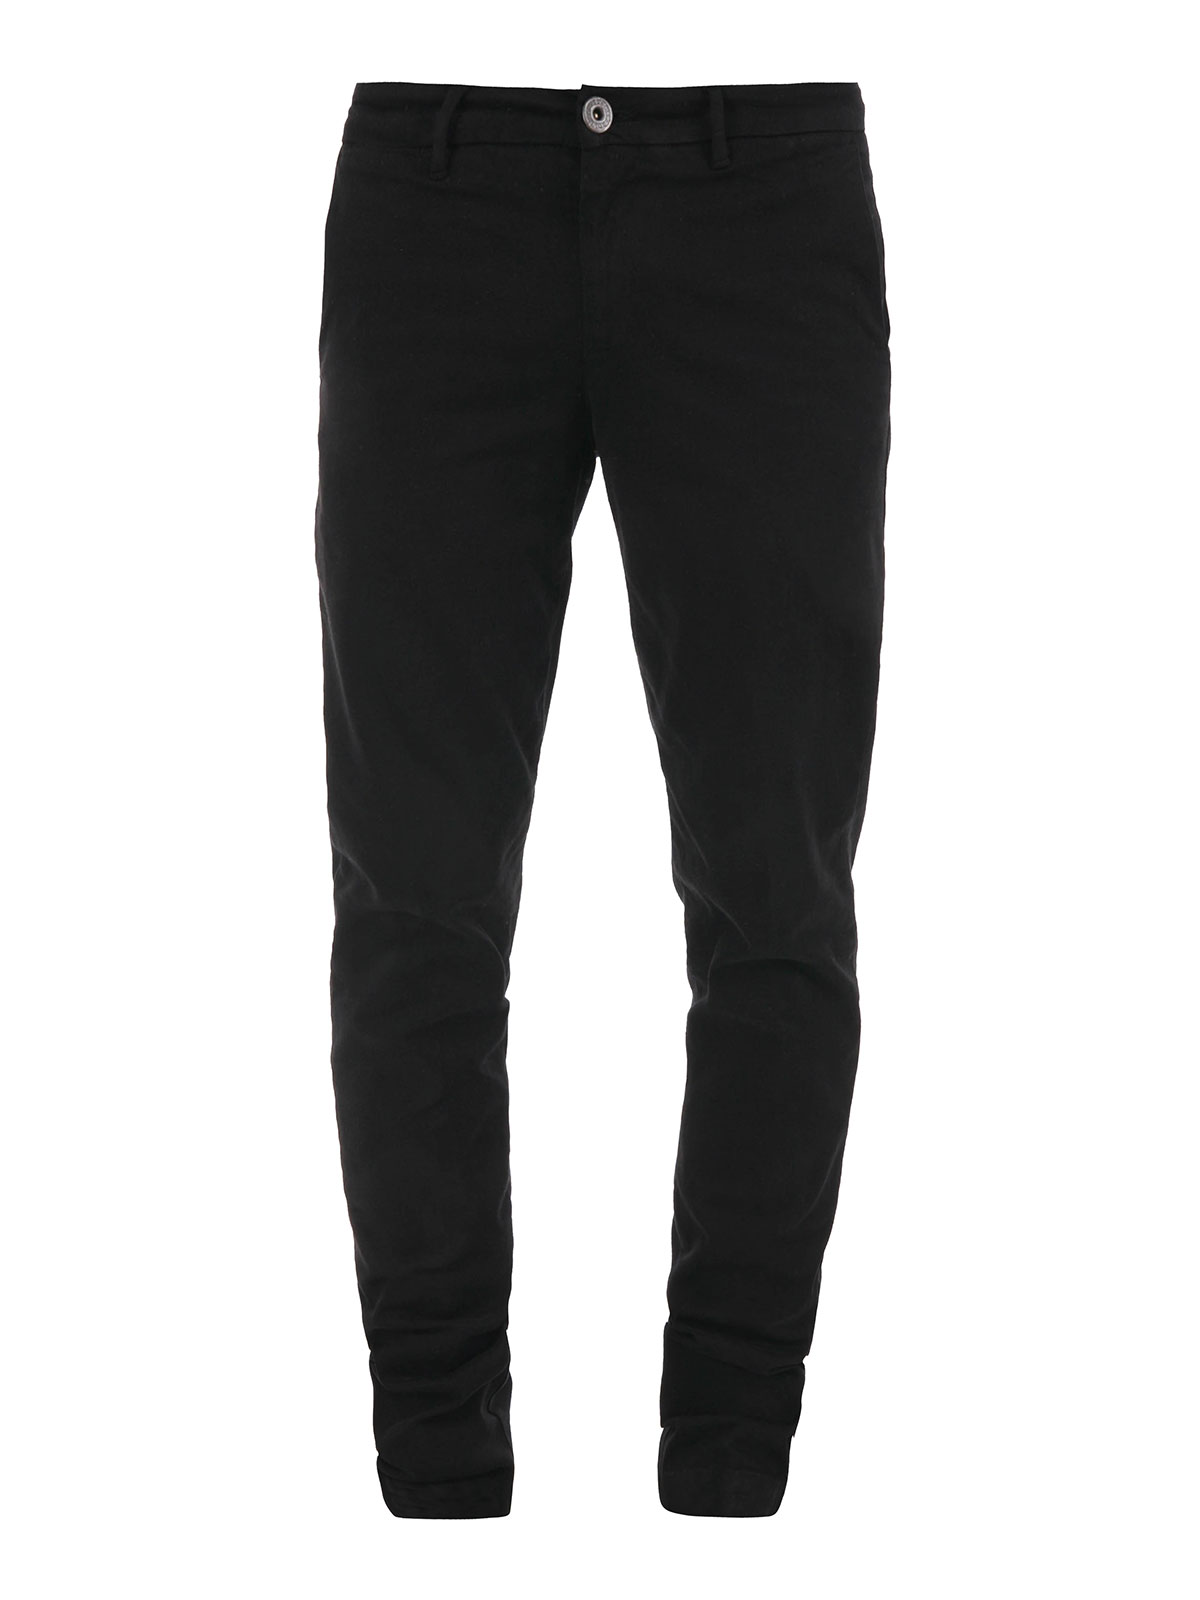 912292413a8 Trussardi - Pantalón De Traje Negro Para Hombre - Pantalones casual ...